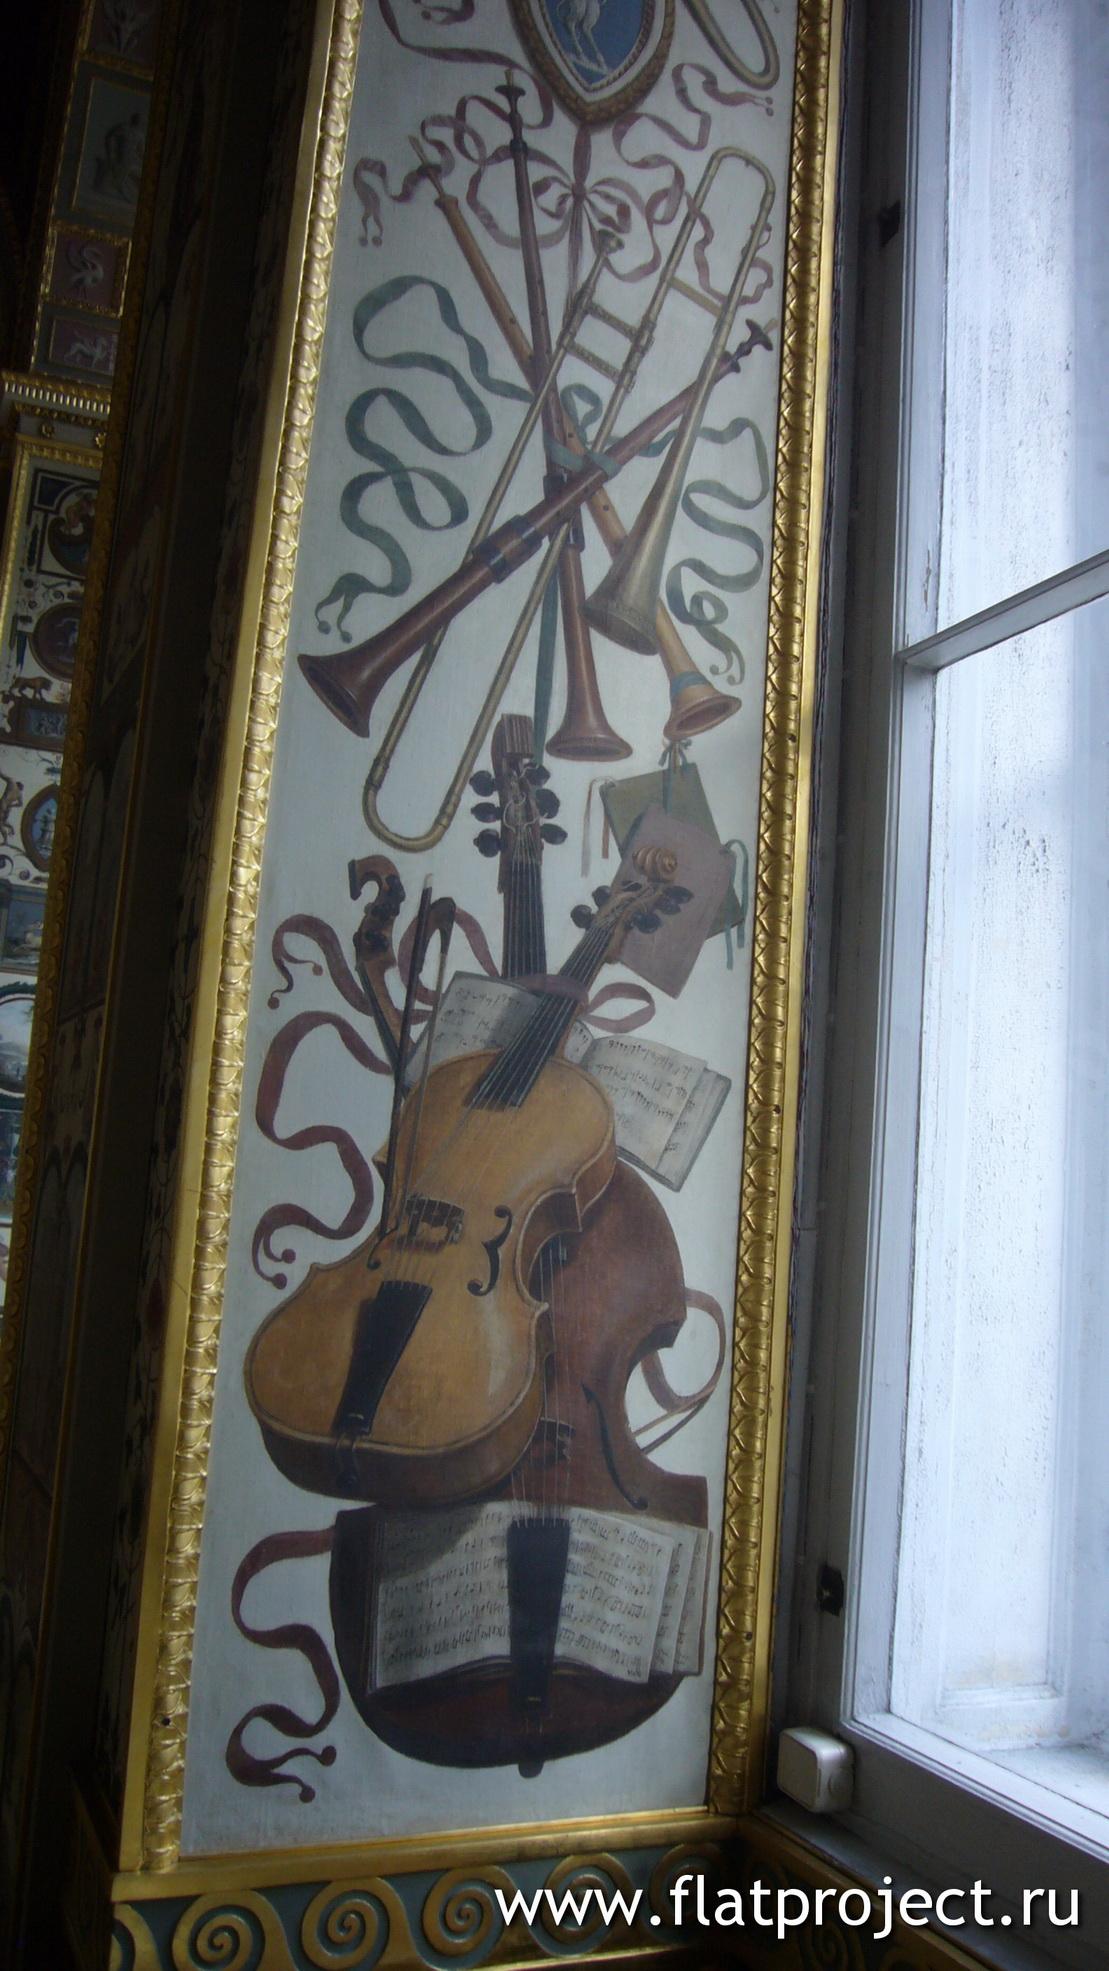 The State Hermitage museum interiors – photo 129